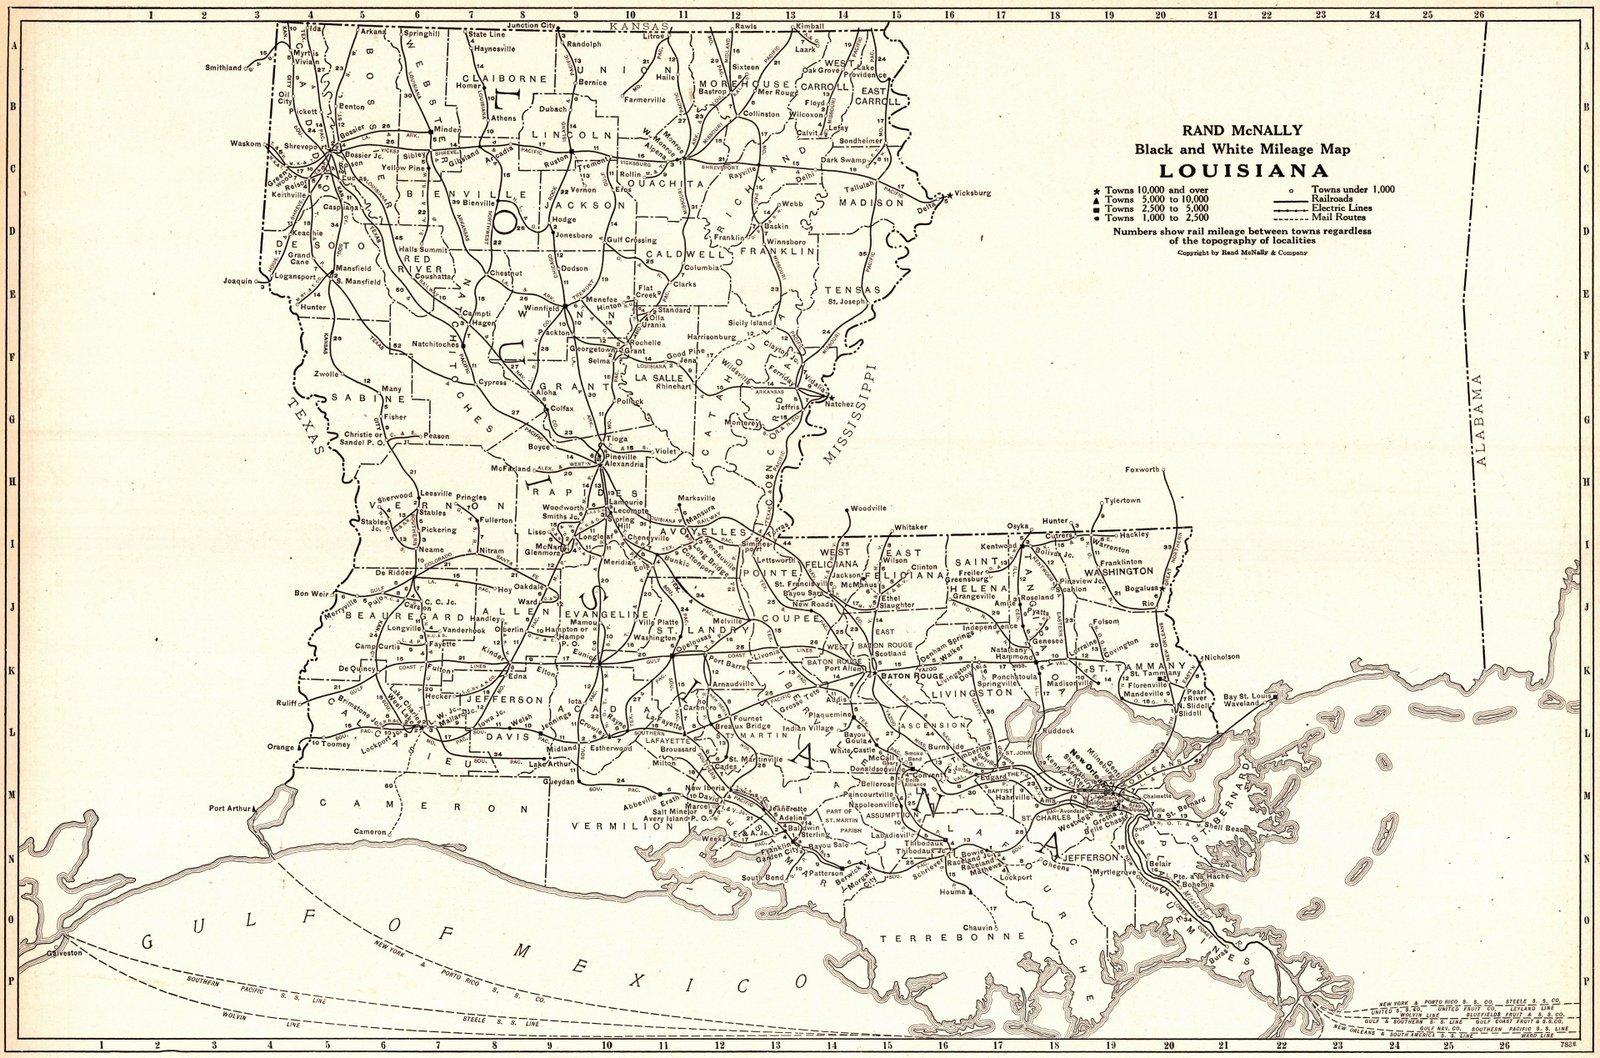 Historic Map   1921 Louisiana- Black and White Mileage Map   Rand McNally and Company